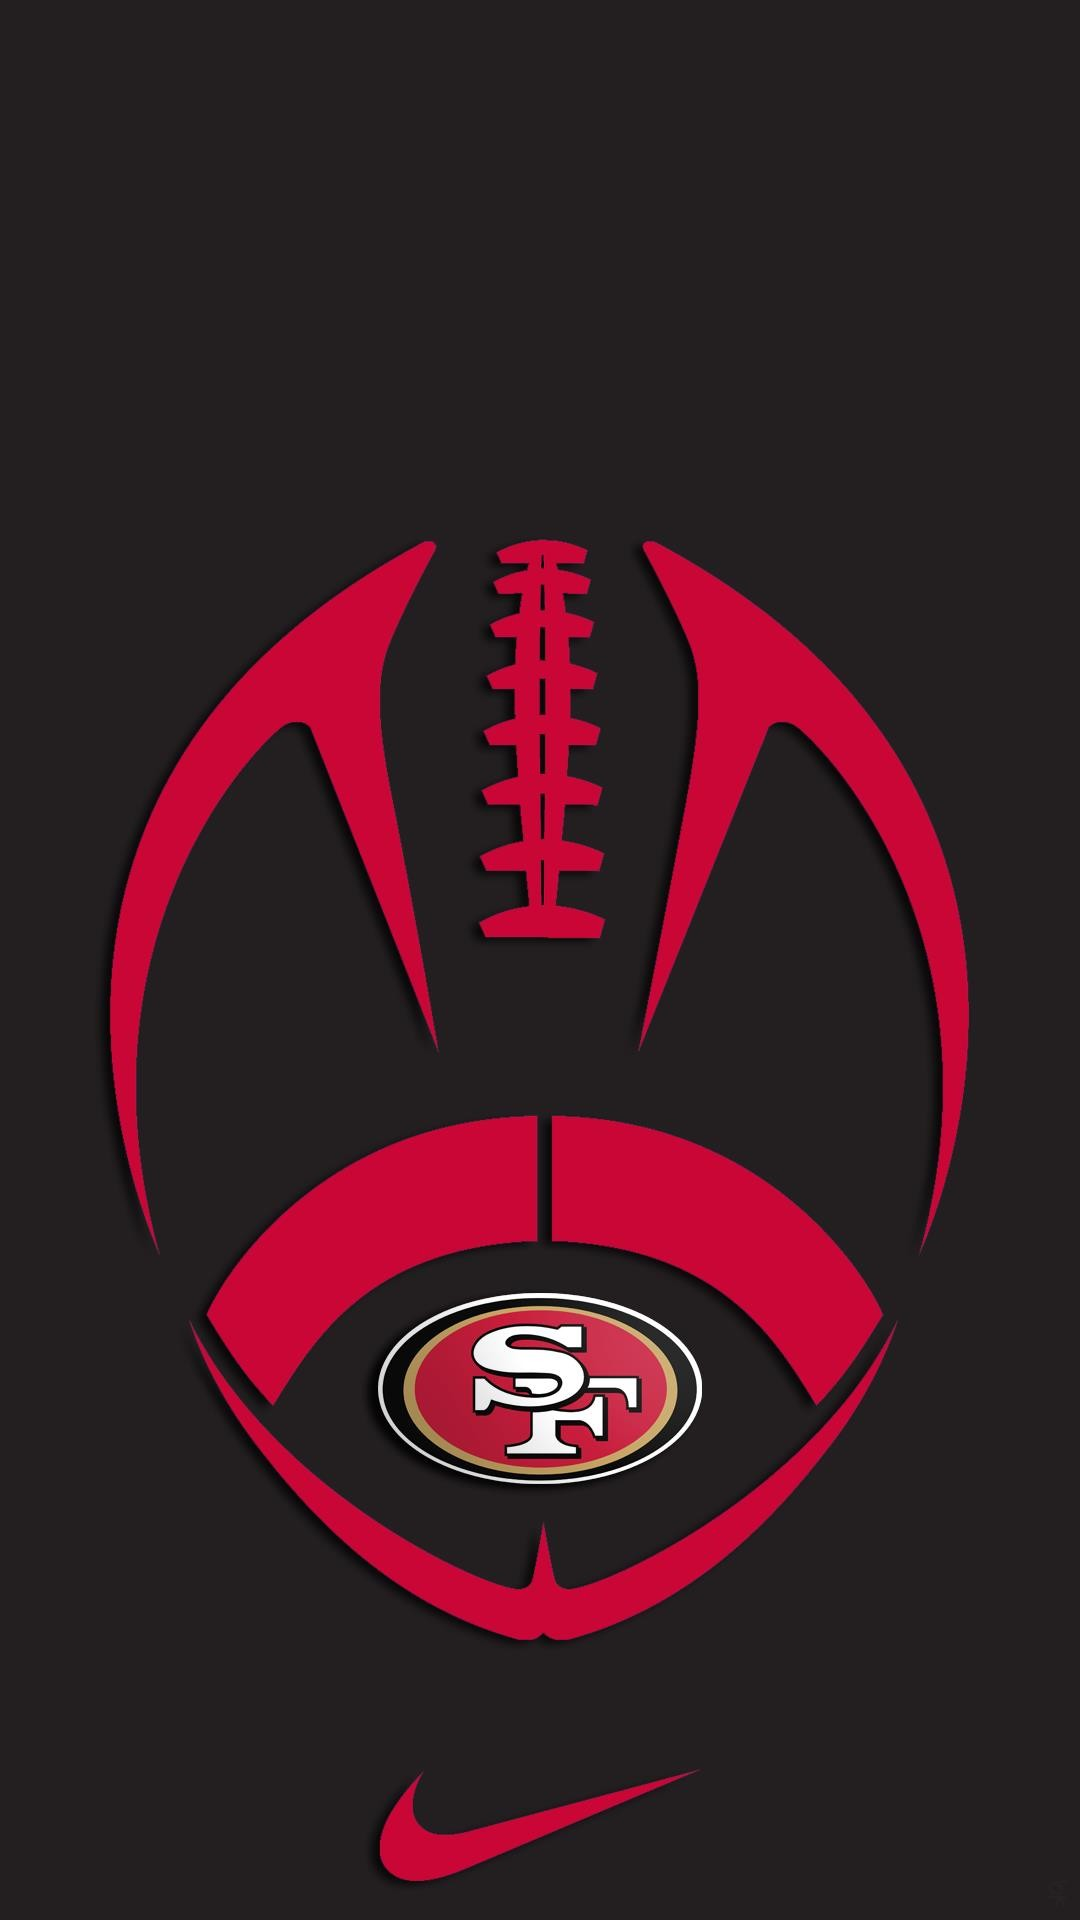 49ers logo wallpaper wallpapertag - 49ers wallpaper hd ...